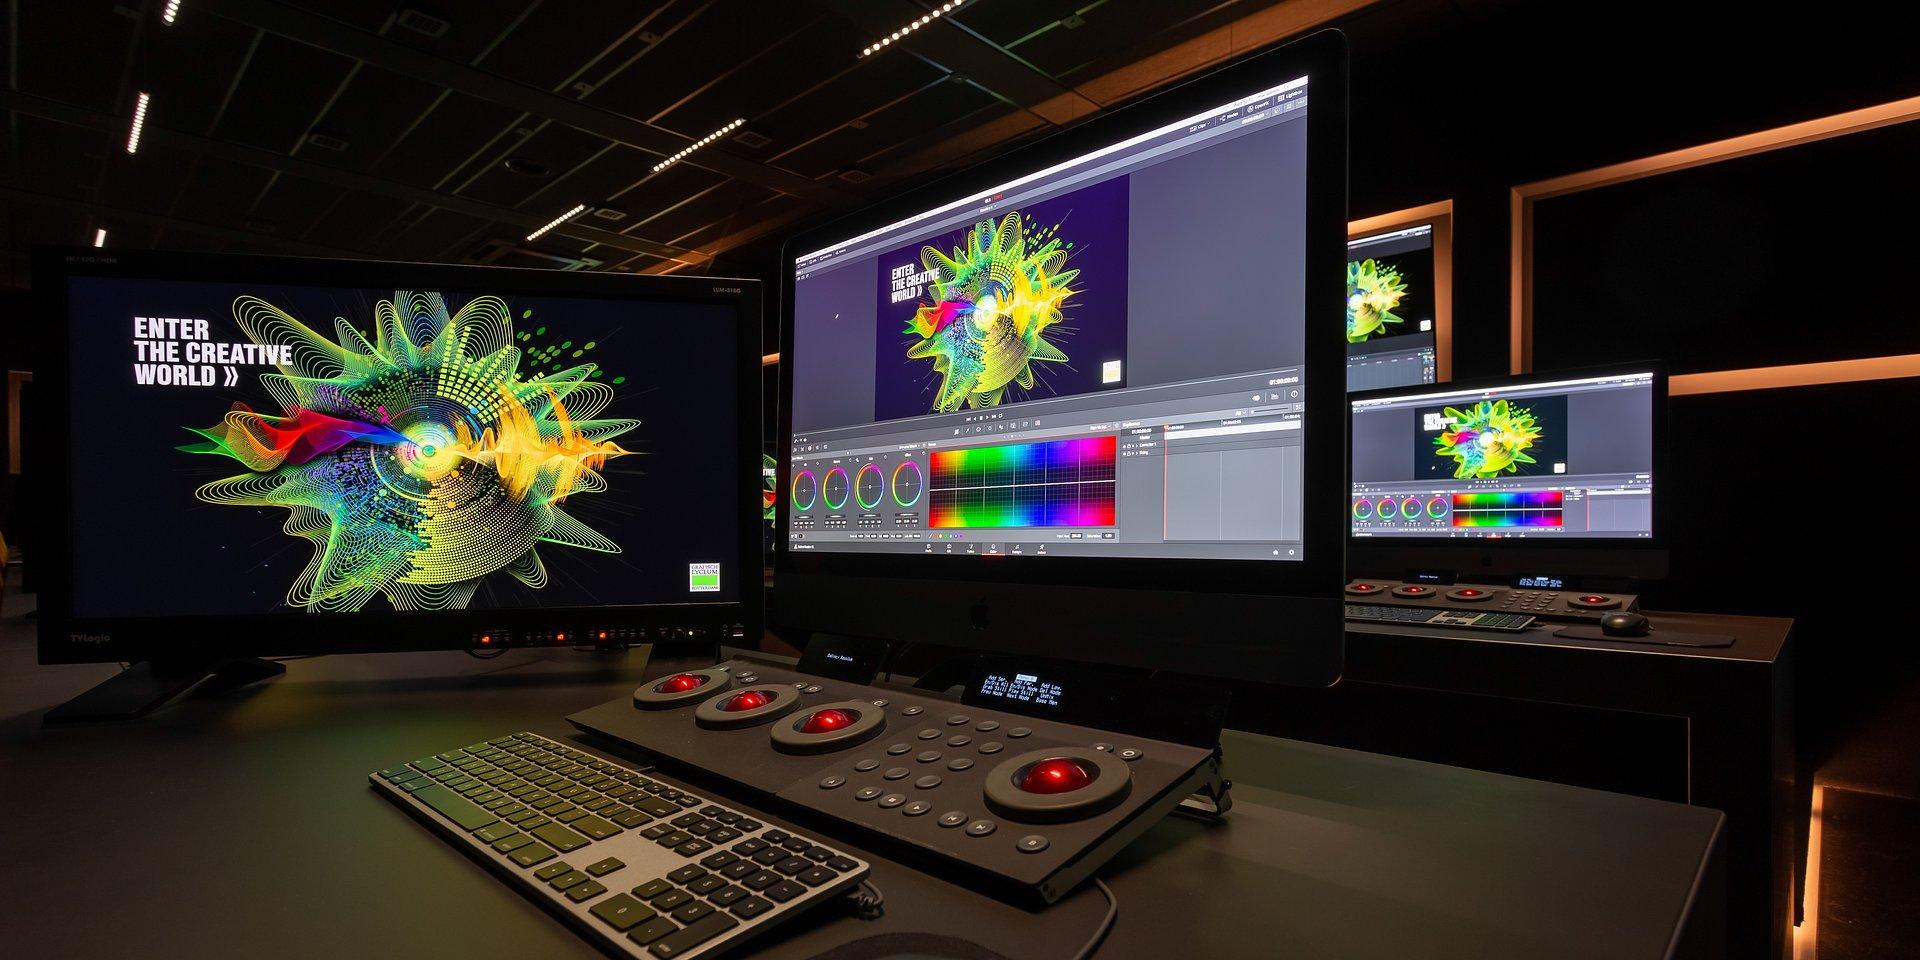 GLR + Extreme = creativity meets technology